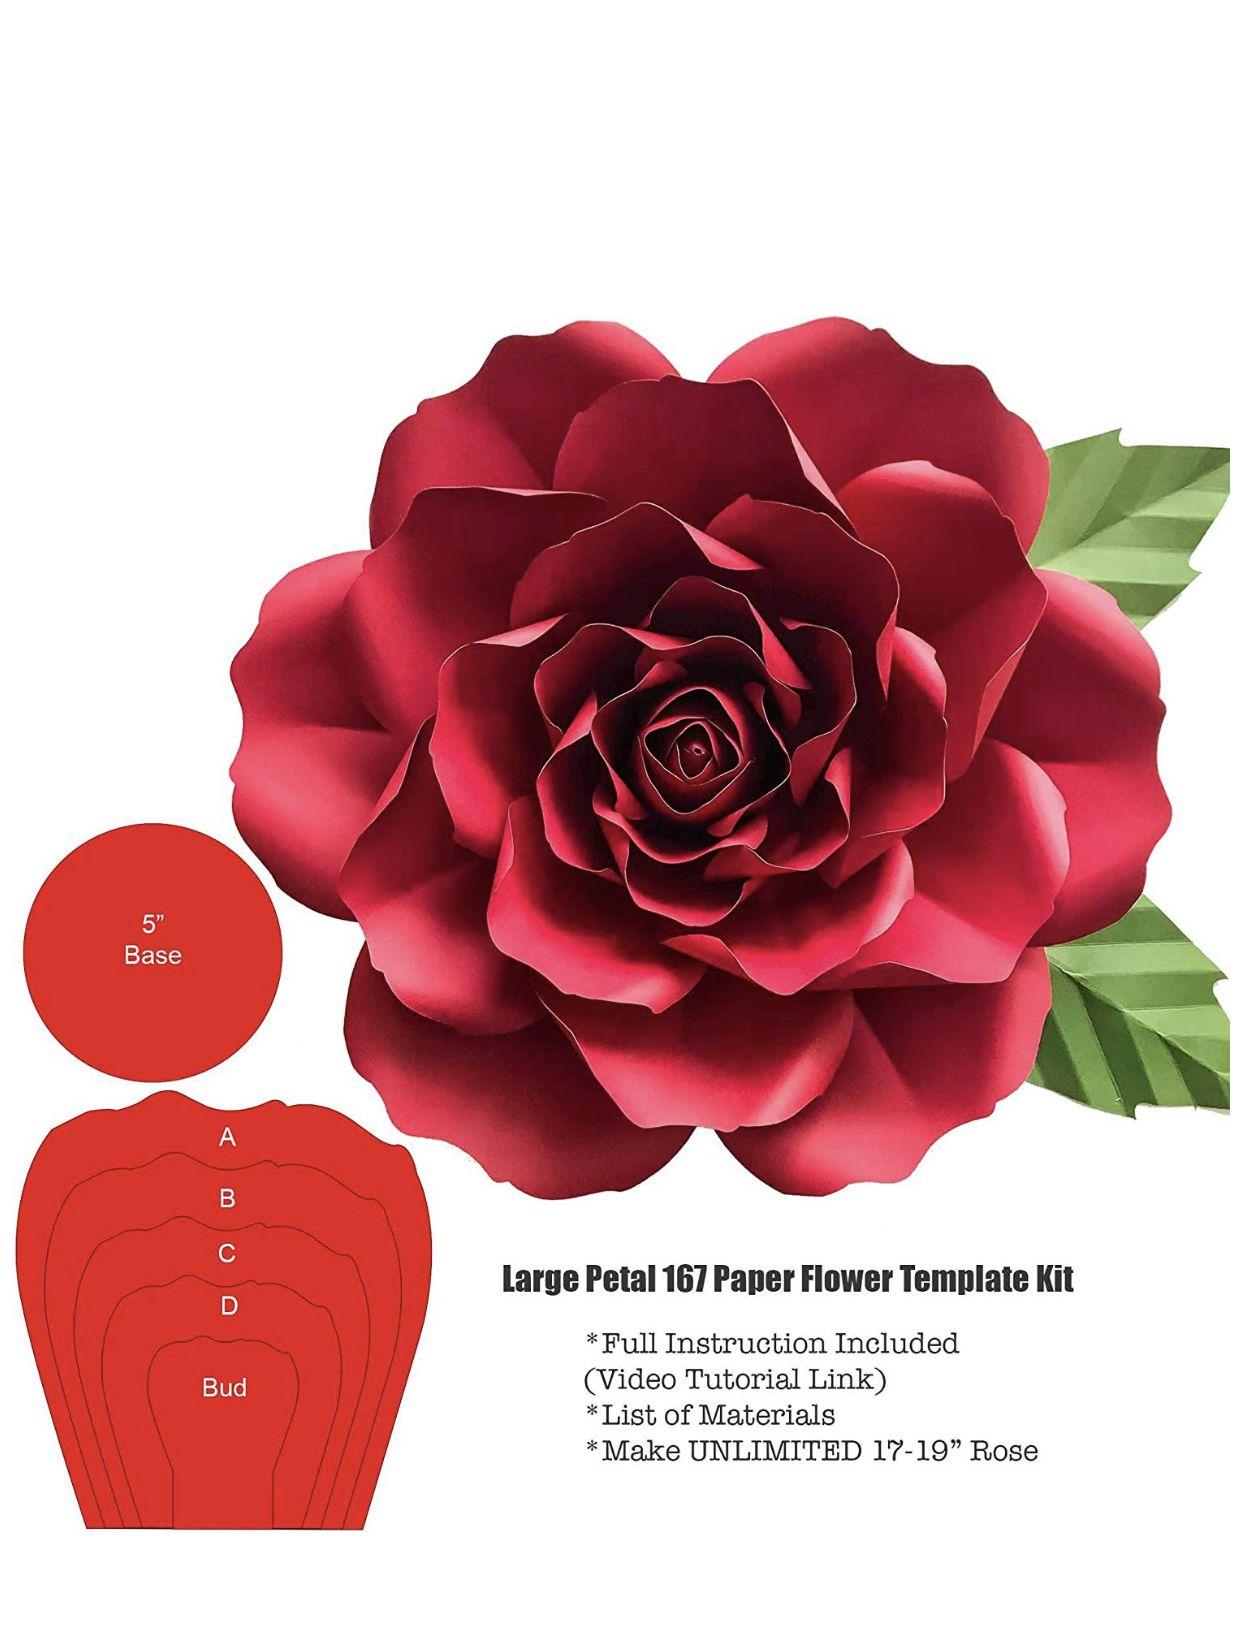 Hard Copy Prtal 167 Paper Flower Template From Amazon Paper Flower Template Paper Flowers Craft Paper Flowers